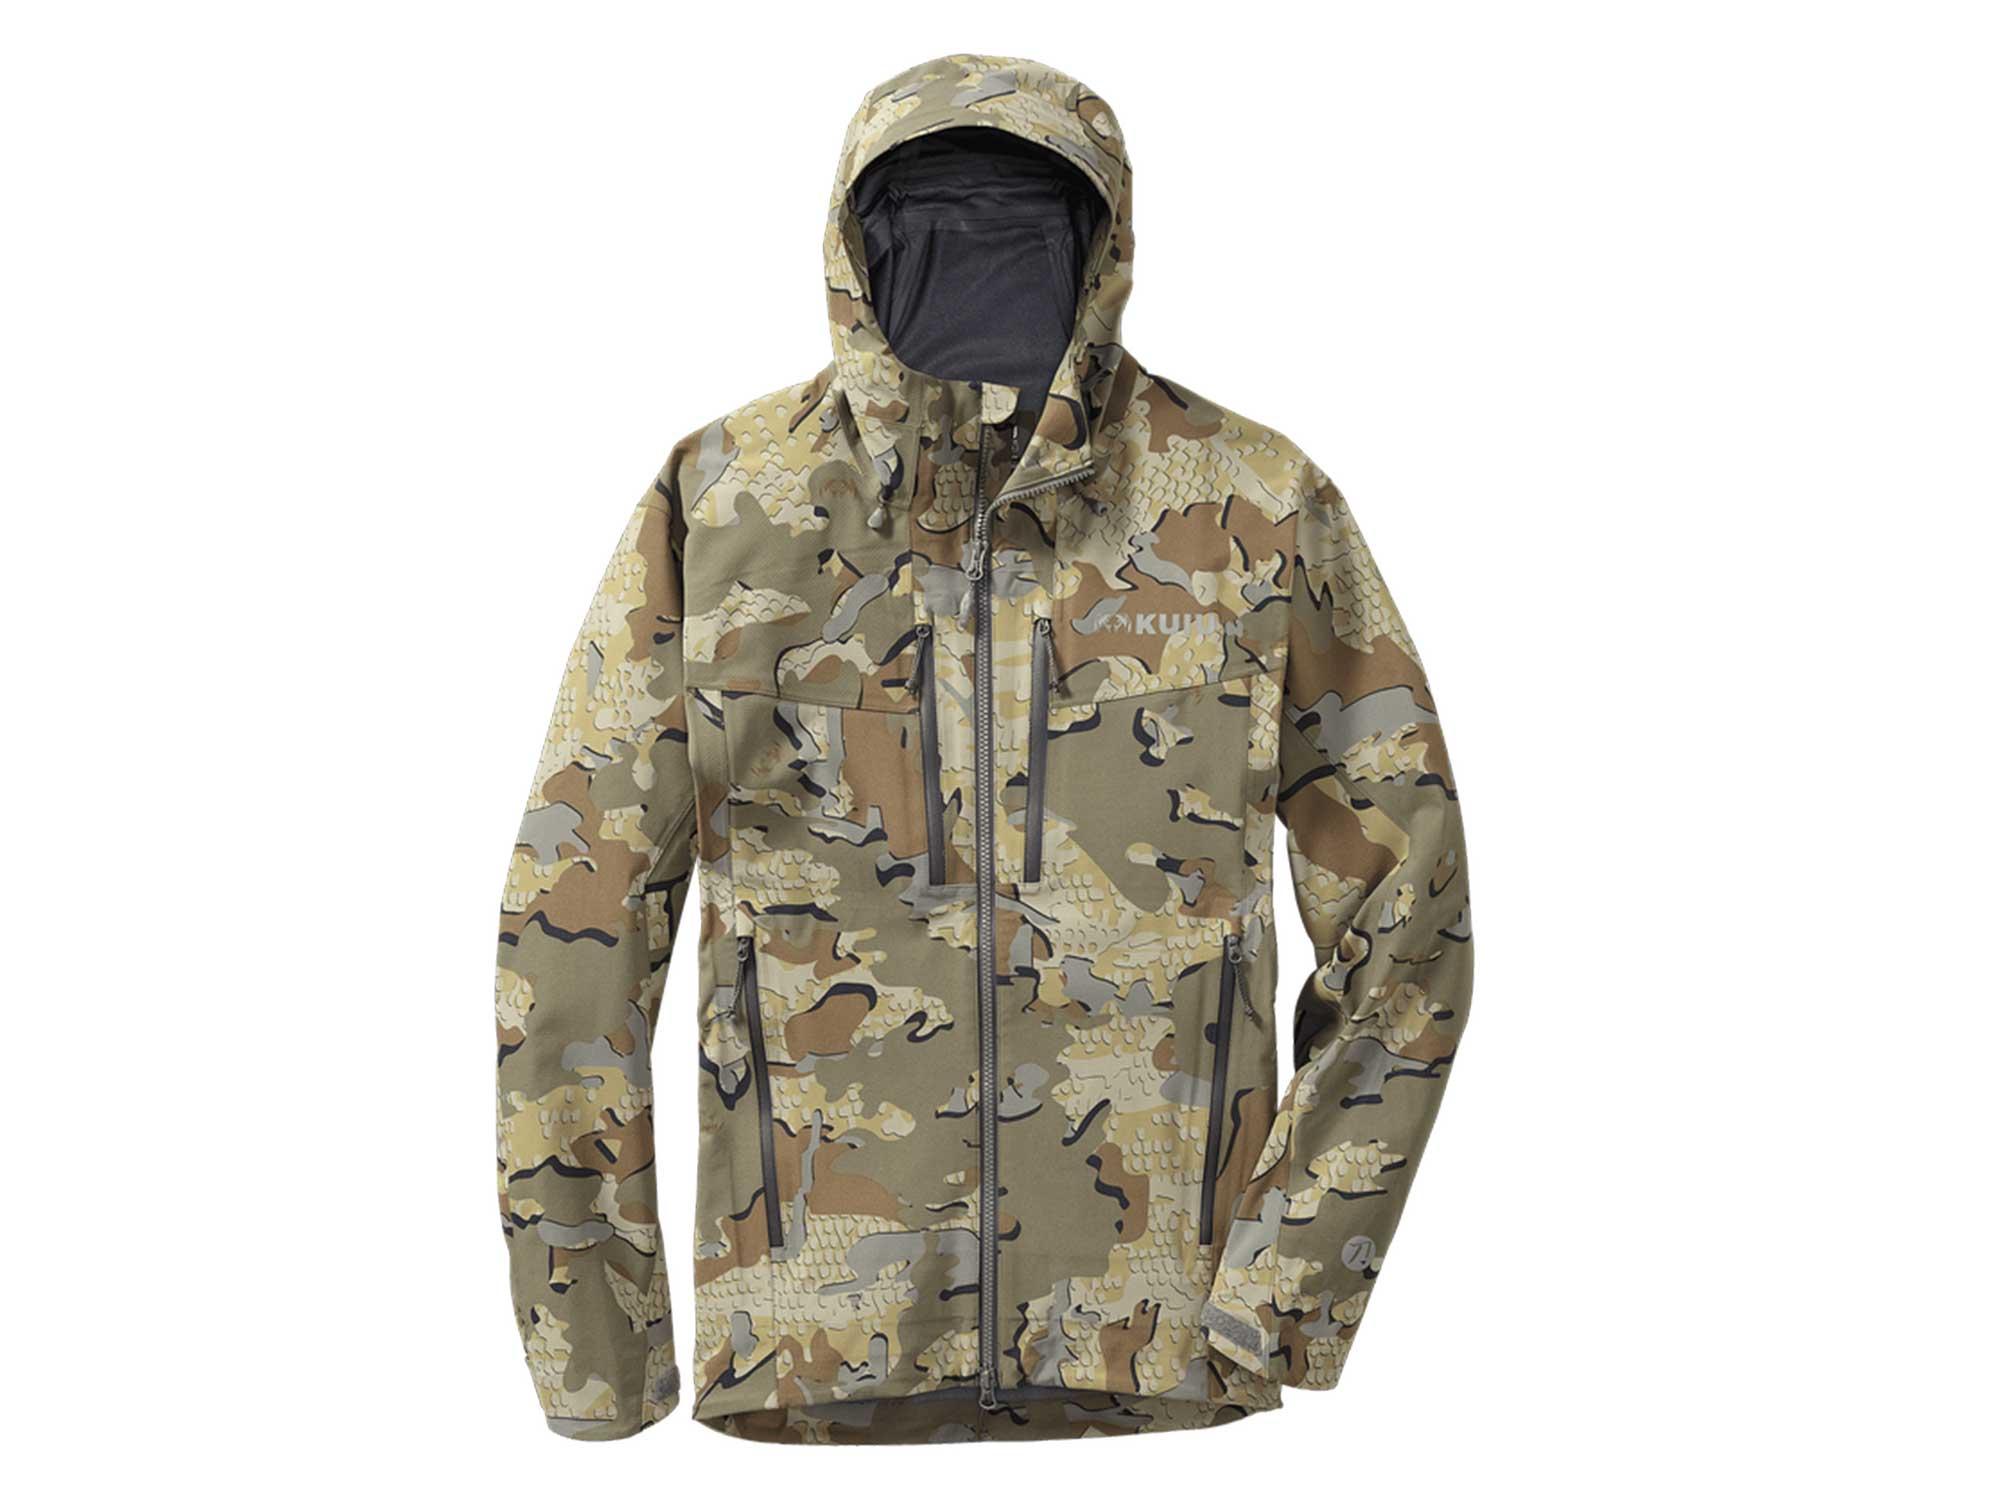 KUIU Kutana Storm Shell Jacket